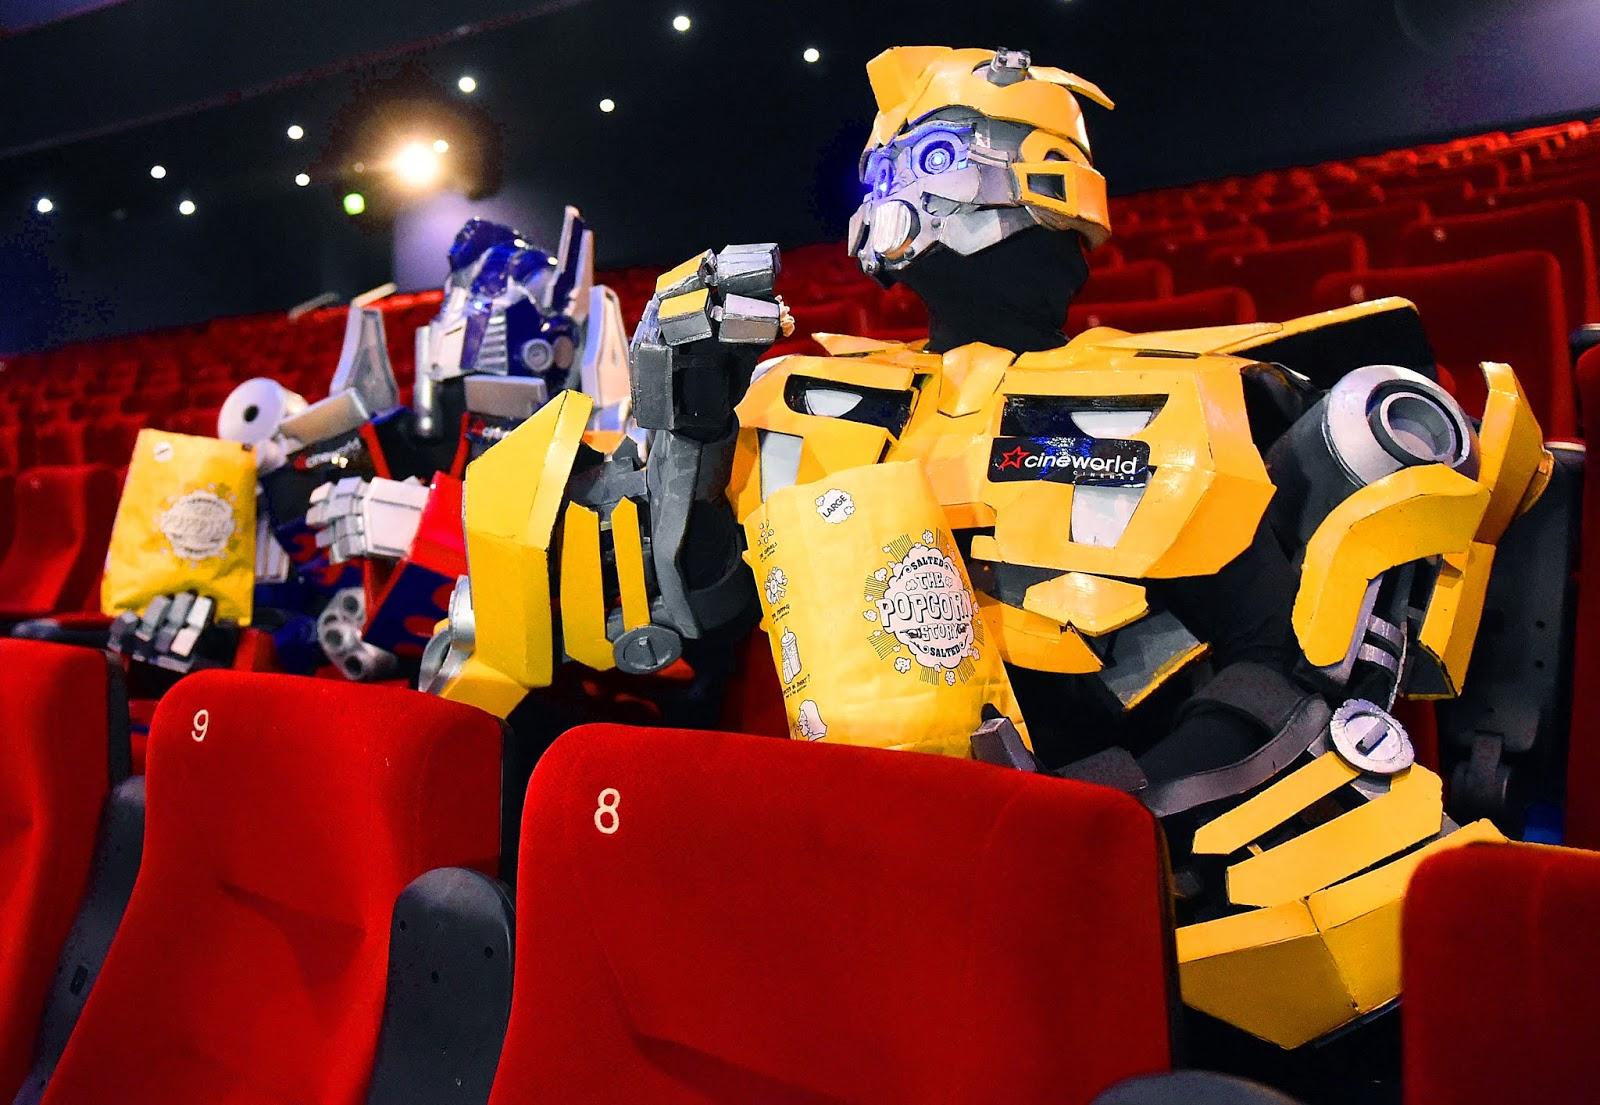 transformers cineworld